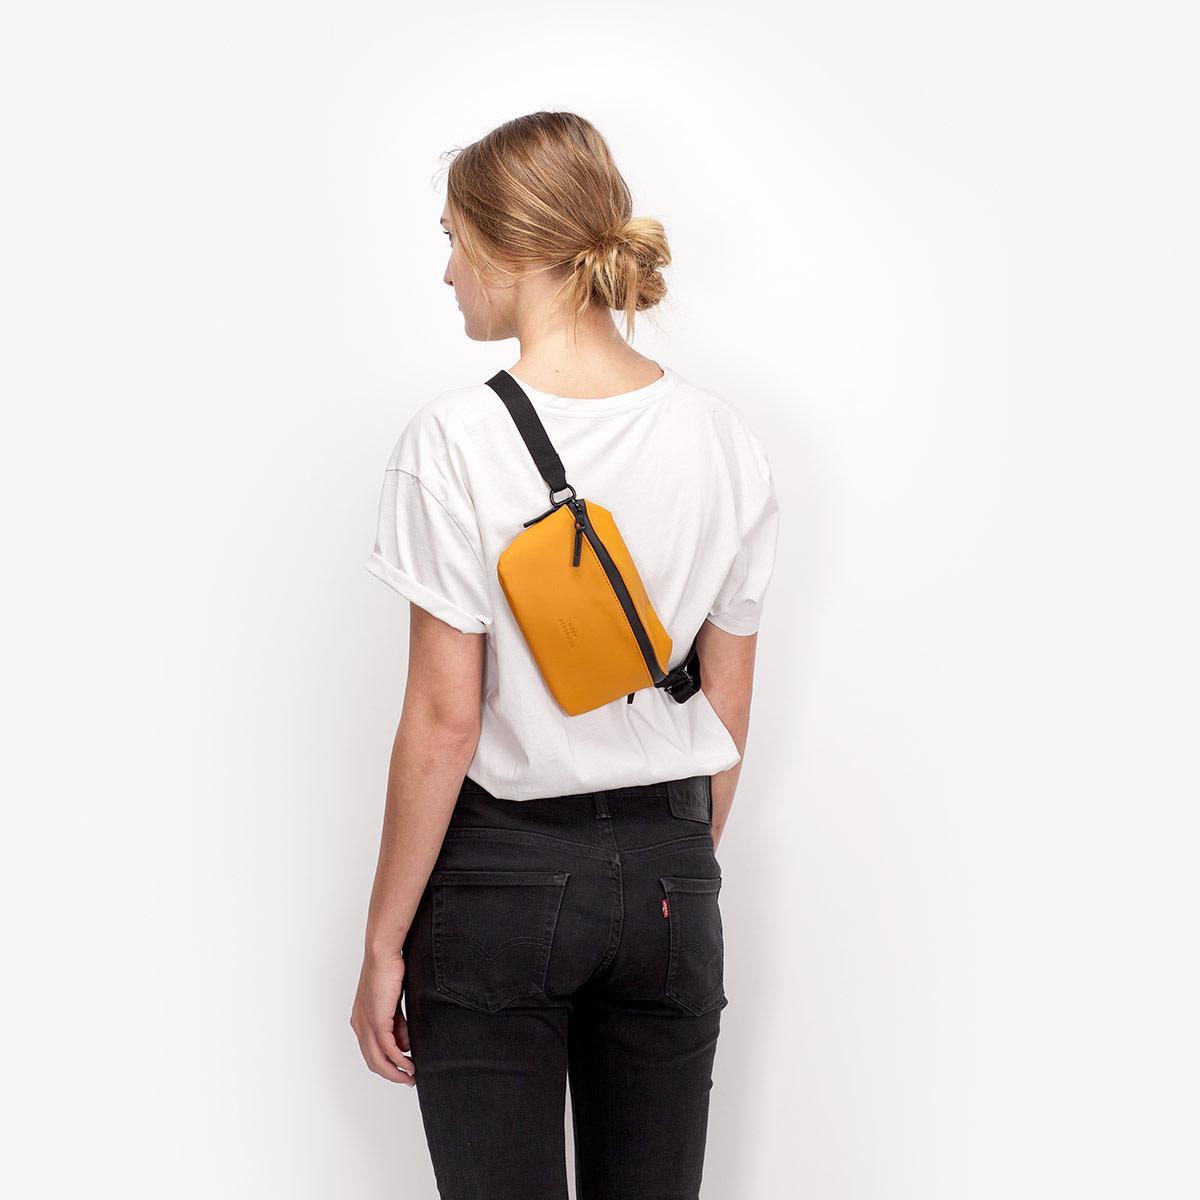 UA_Jona-Bag_Lotus-Series_Honey-Mustard_07